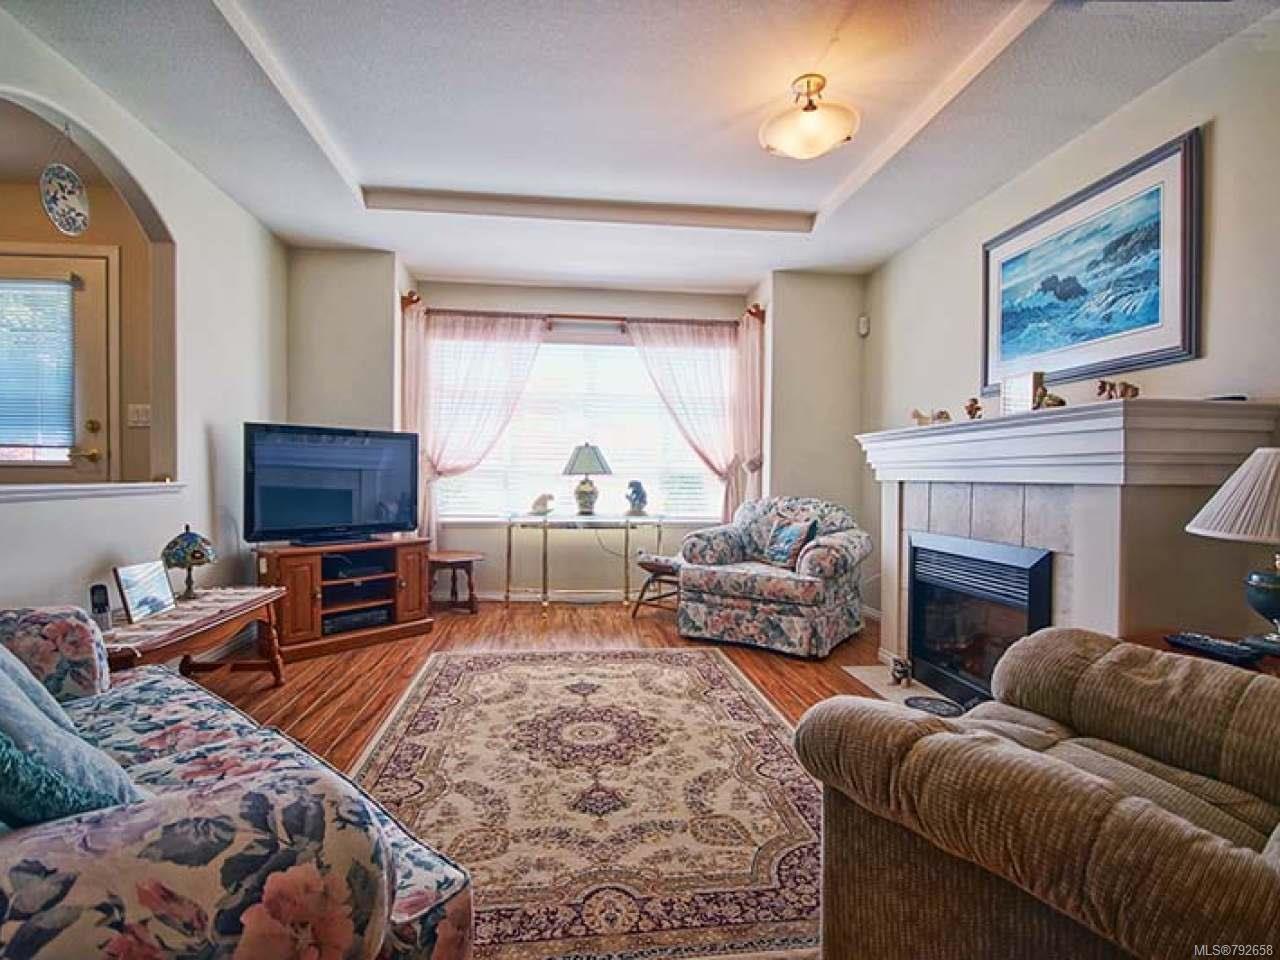 Photo 14: Photos: 893 EDGEWARE Avenue in PARKSVILLE: PQ Parksville House for sale (Parksville/Qualicum)  : MLS®# 792658